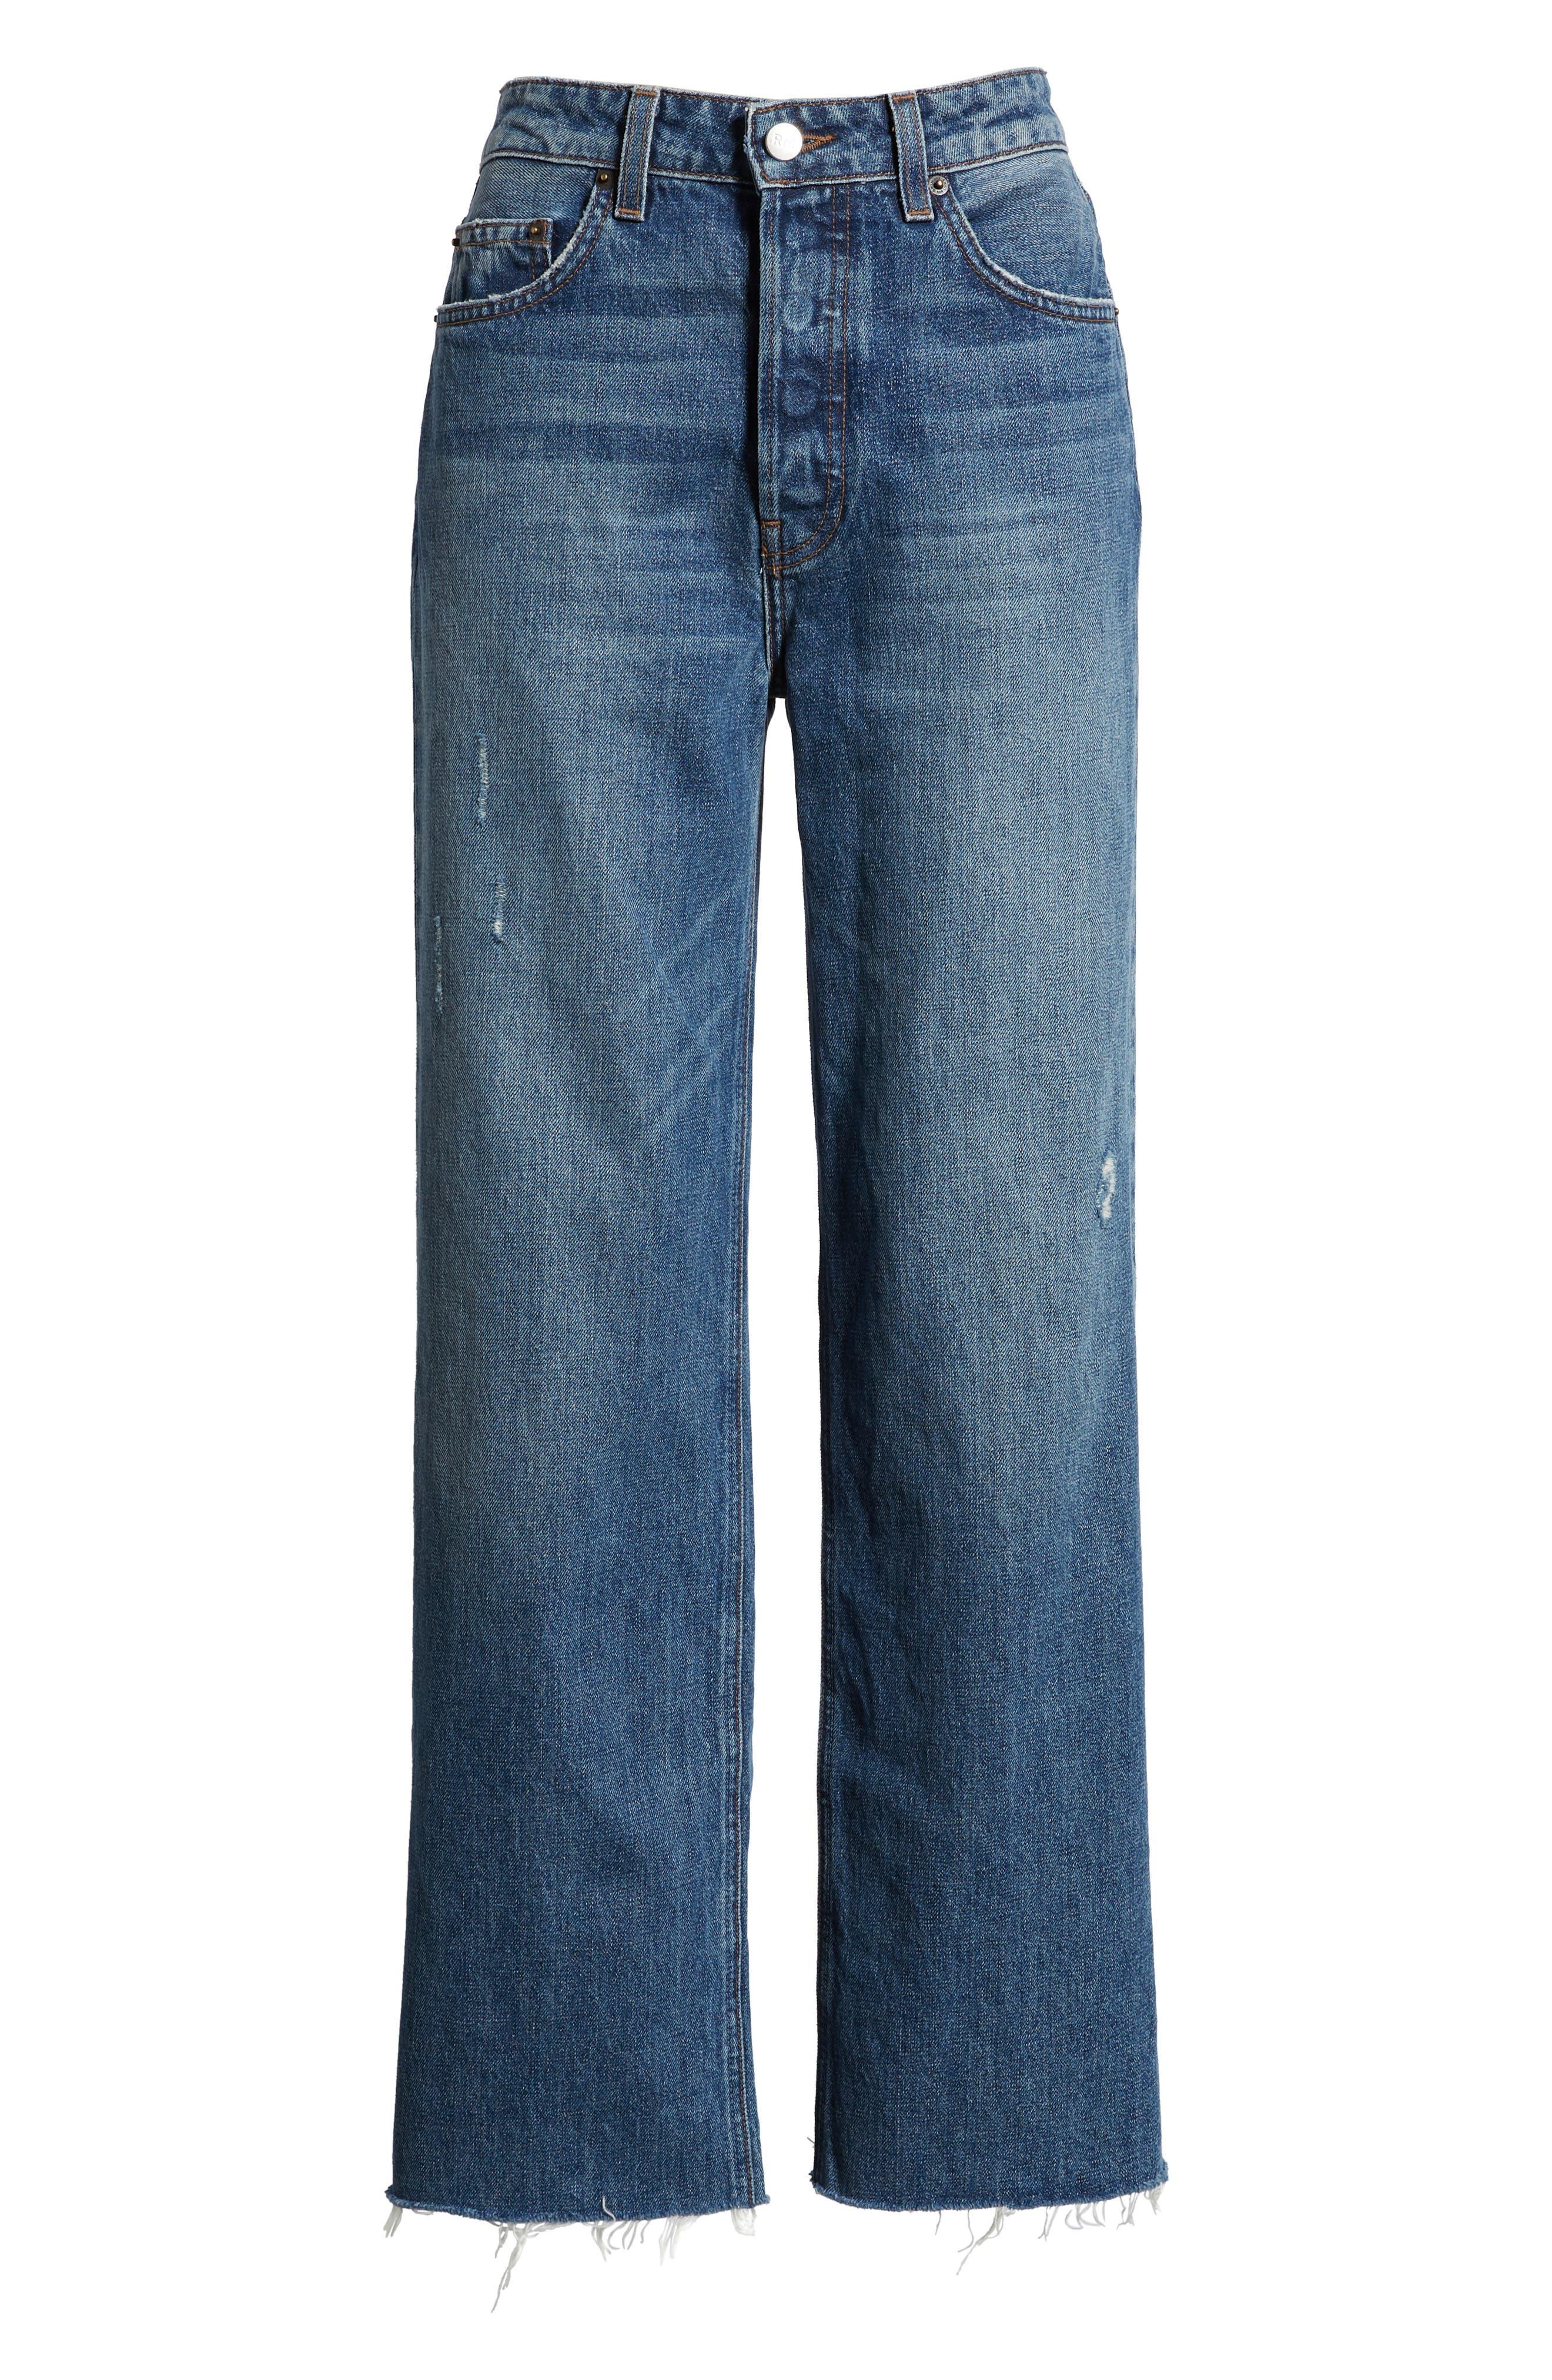 REFORMATION, Fawcett High Waist Crop Jeans, Alternate thumbnail 5, color, CELTIC